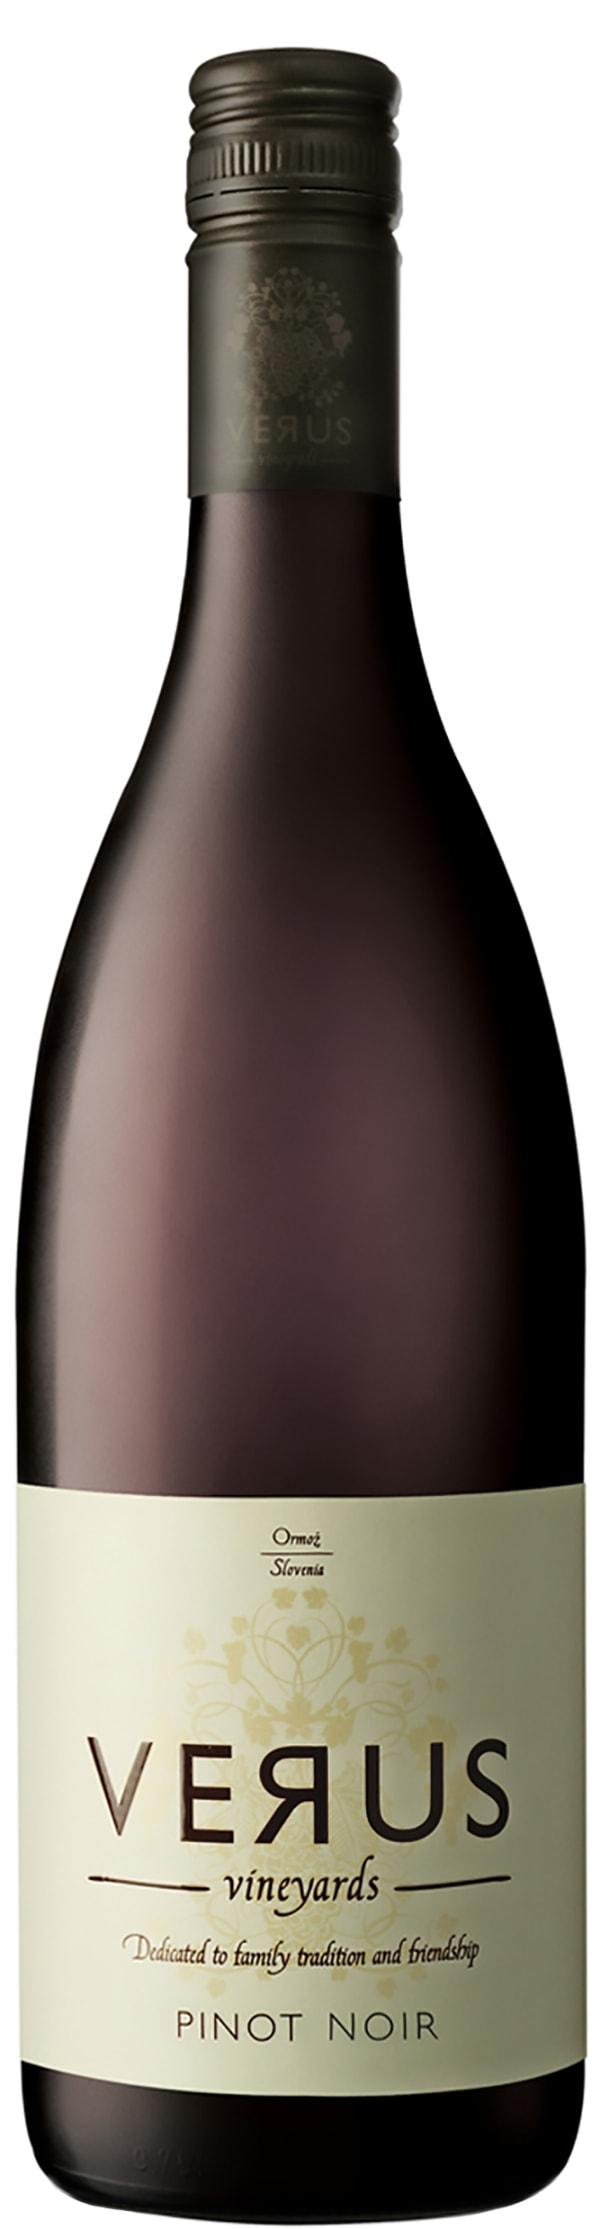 Verus Pinot Noir 2013